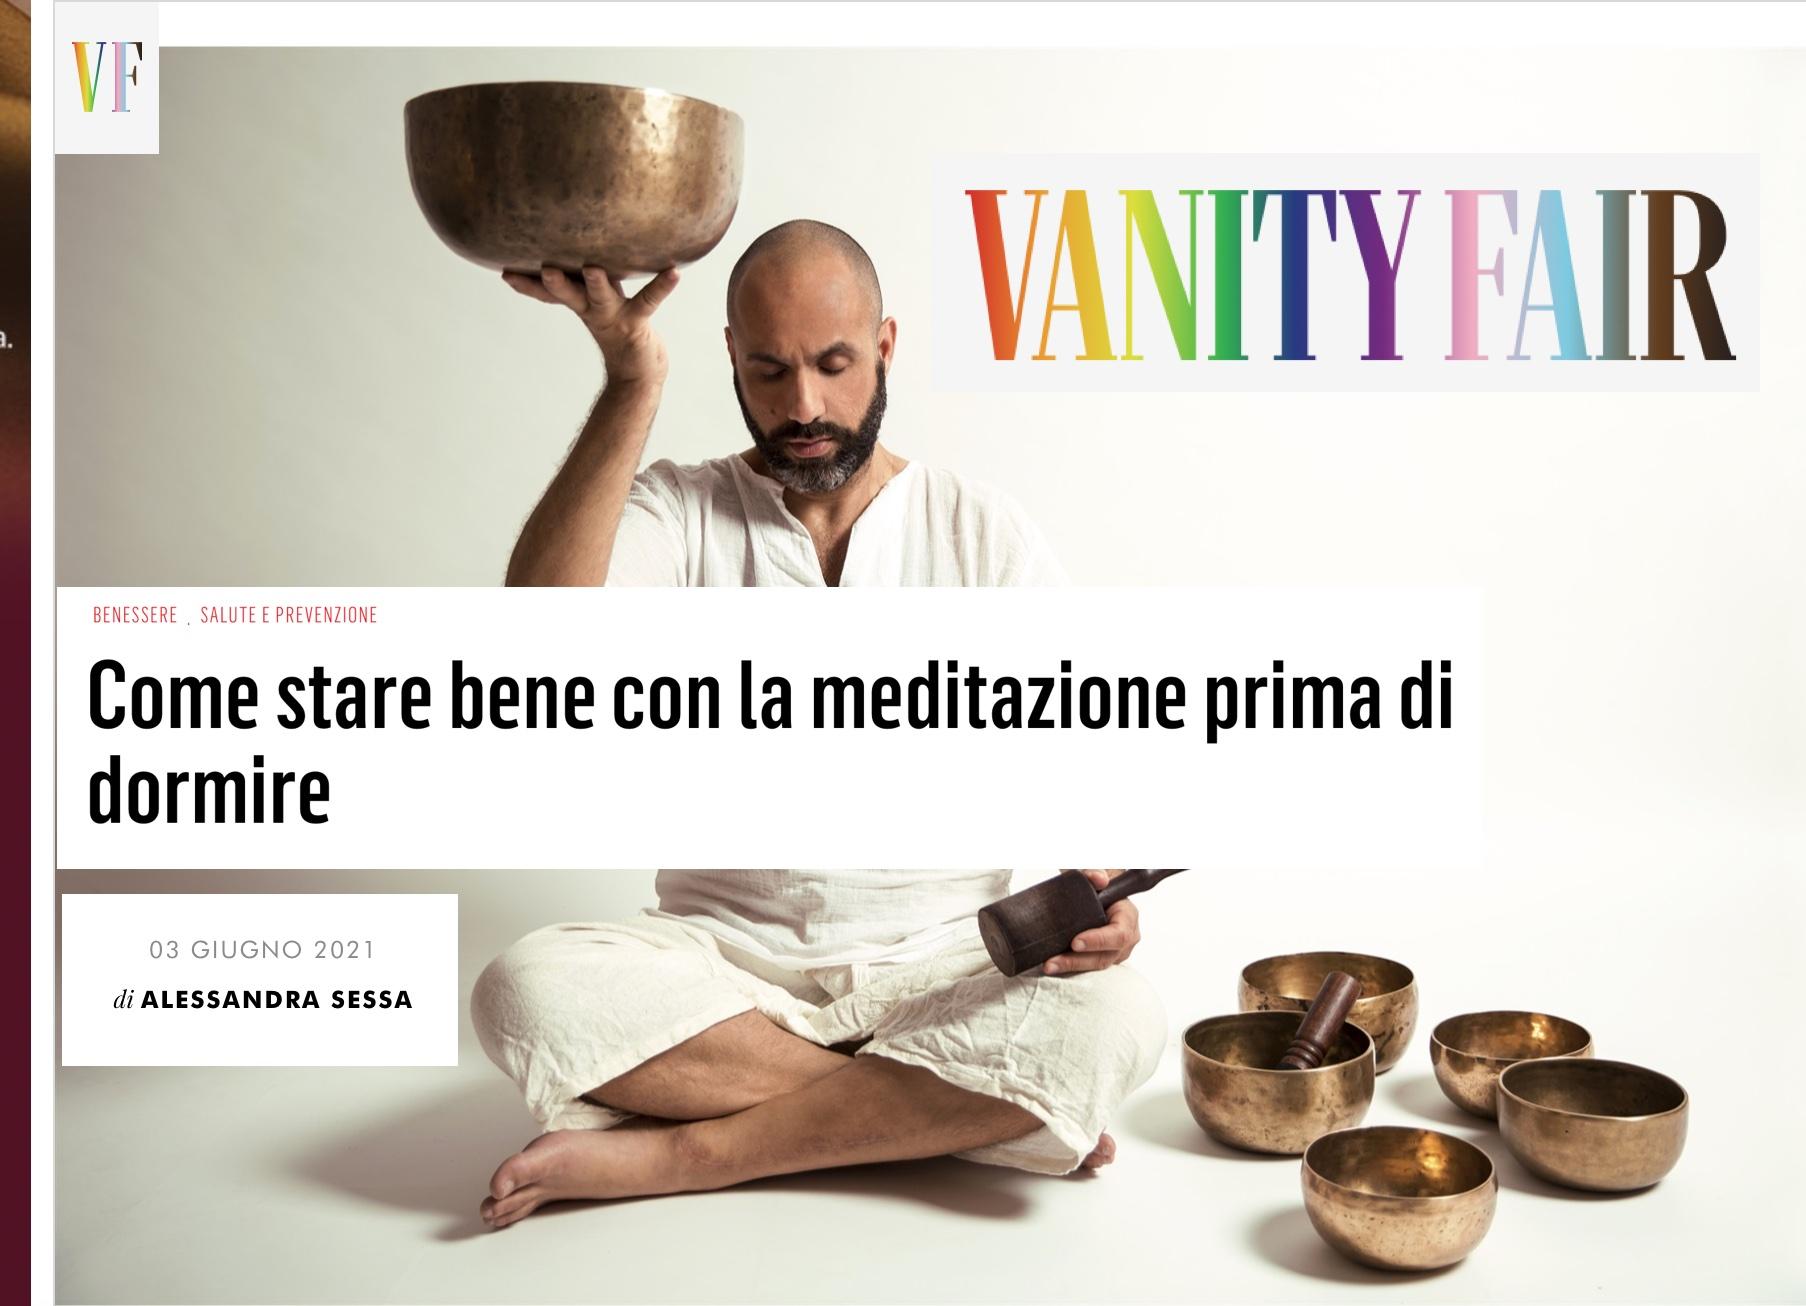 Vanity fair giugno 2021